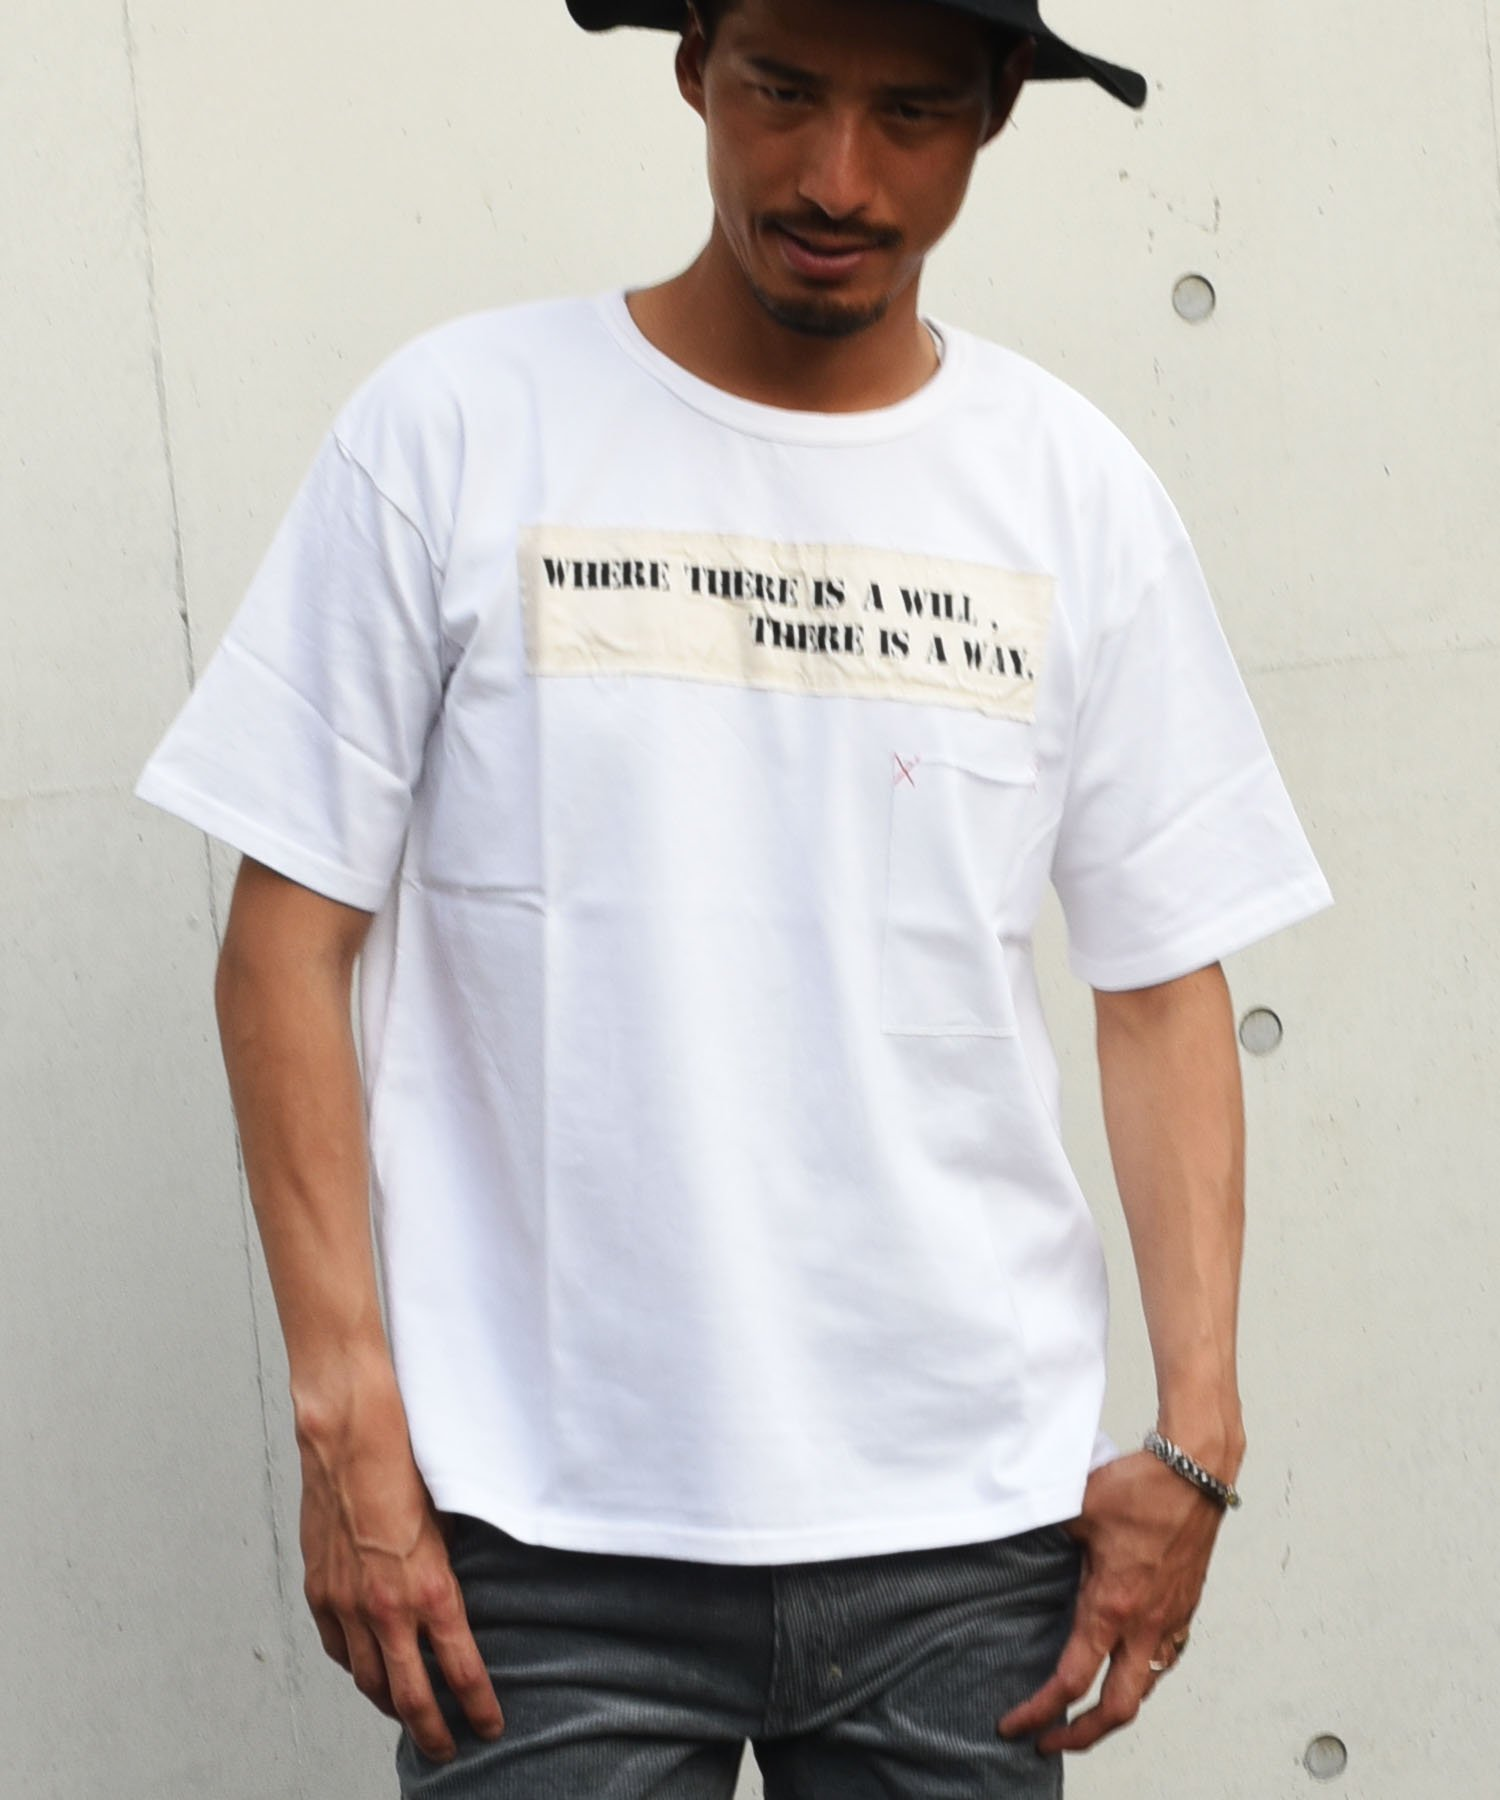 BURNOUT(バーンアウト )ポケット付き ワイドショートスリーブTシャツ / ホワイト